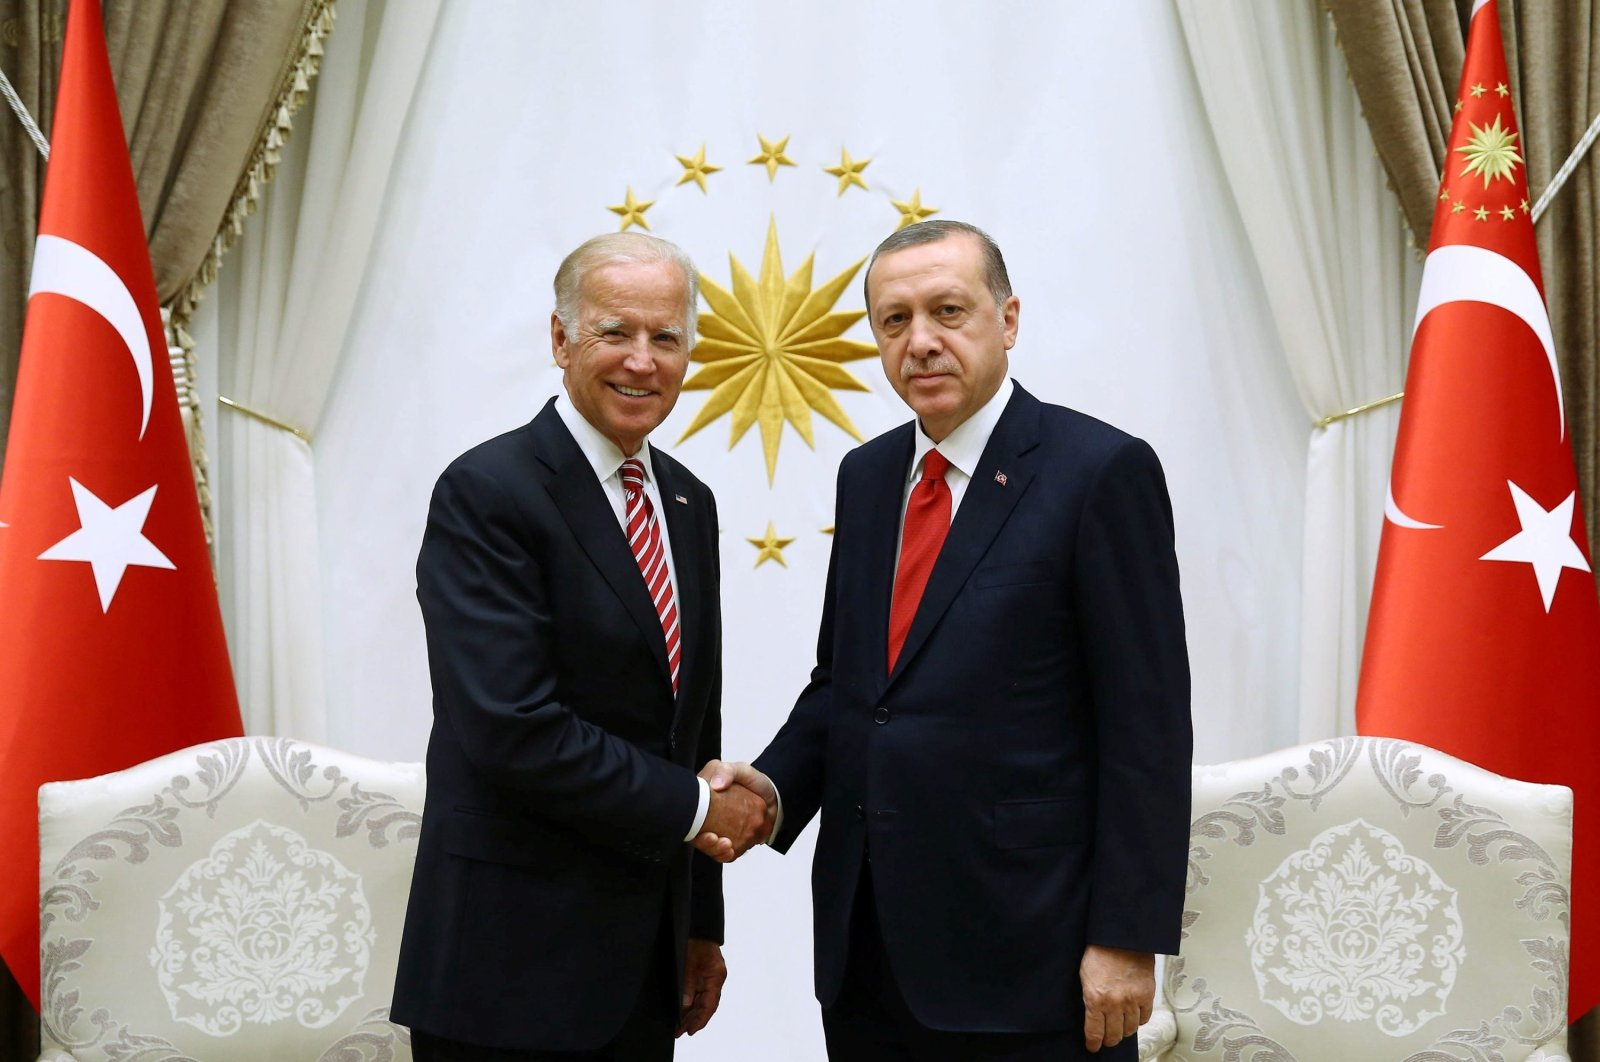 Turkish President Recep Tayyip Erdoğan meets with U.S. then-Vice President Joe Biden at the Presidential Palace in Ankara, Turkey, Aug. 24, 2016. (Reuters File Photo)